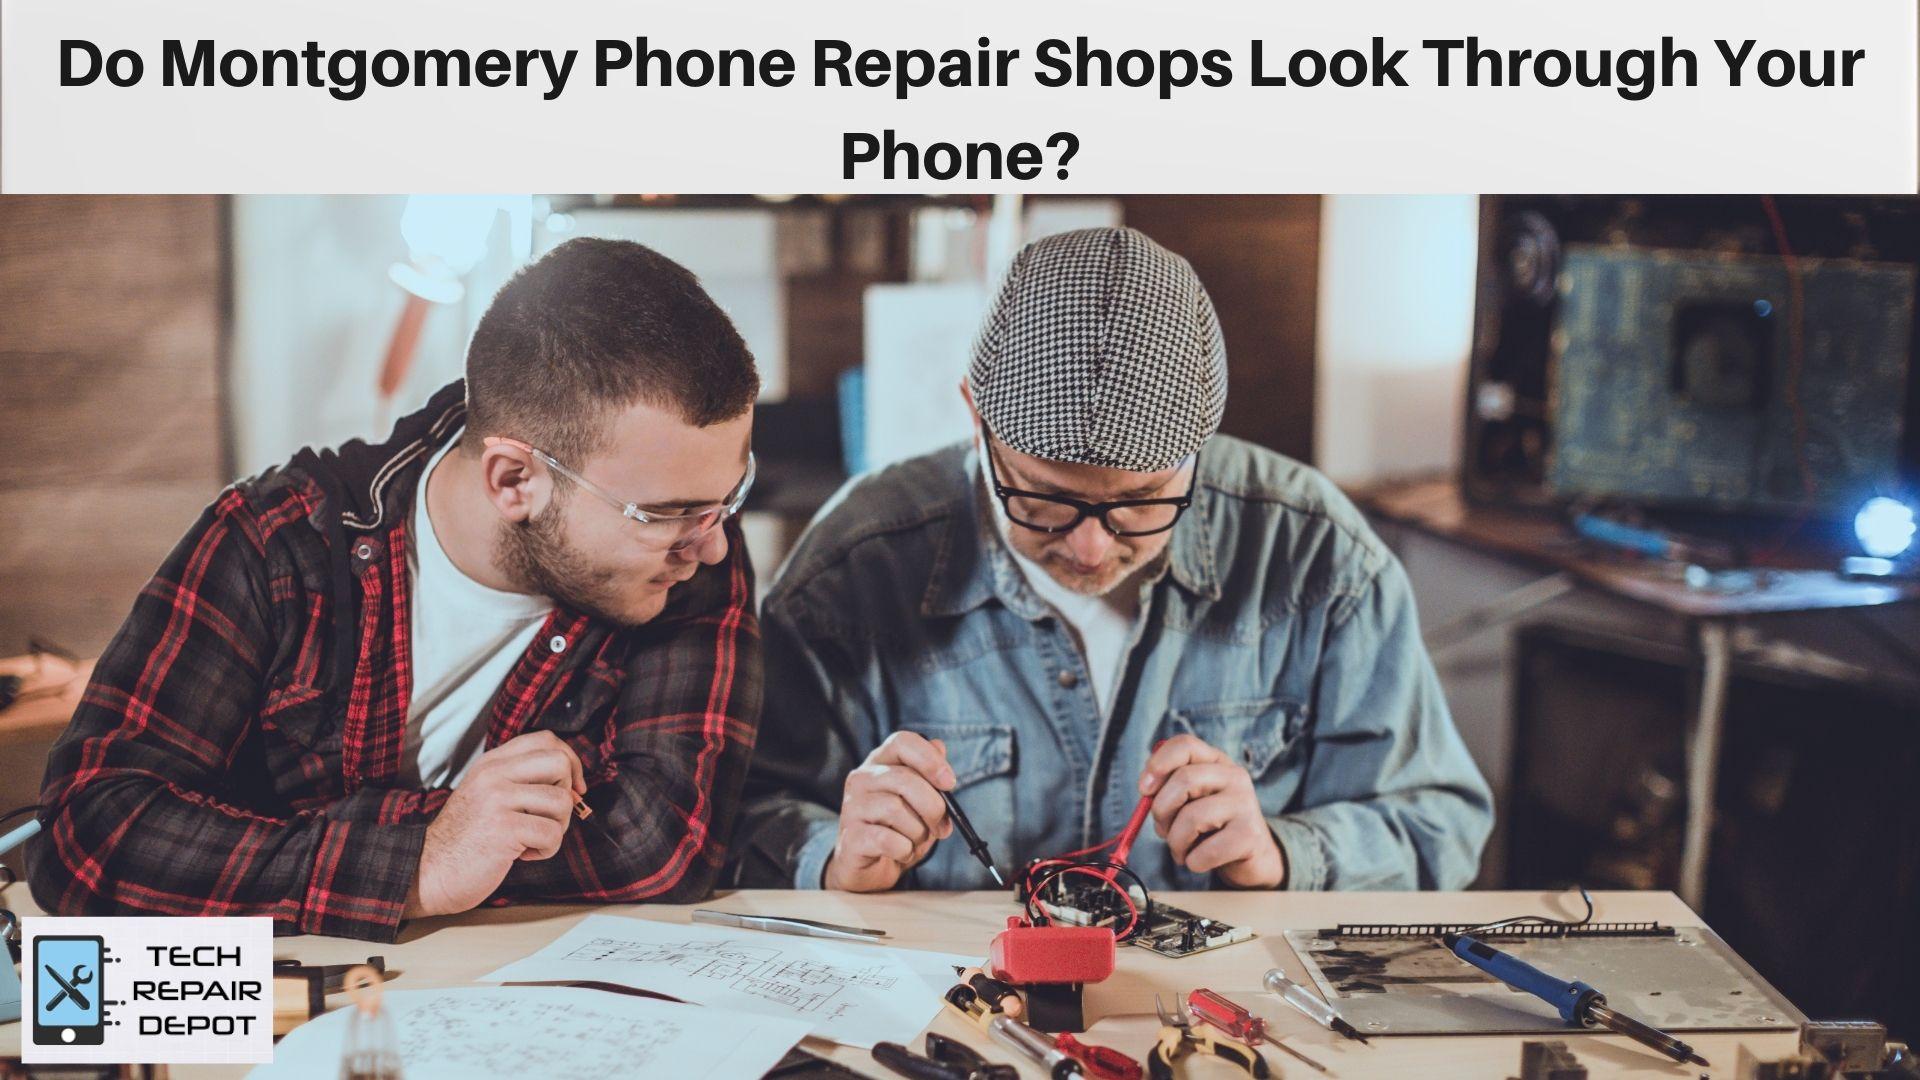 Do Montgomery Phone Repair Shops Look Through Your Phone